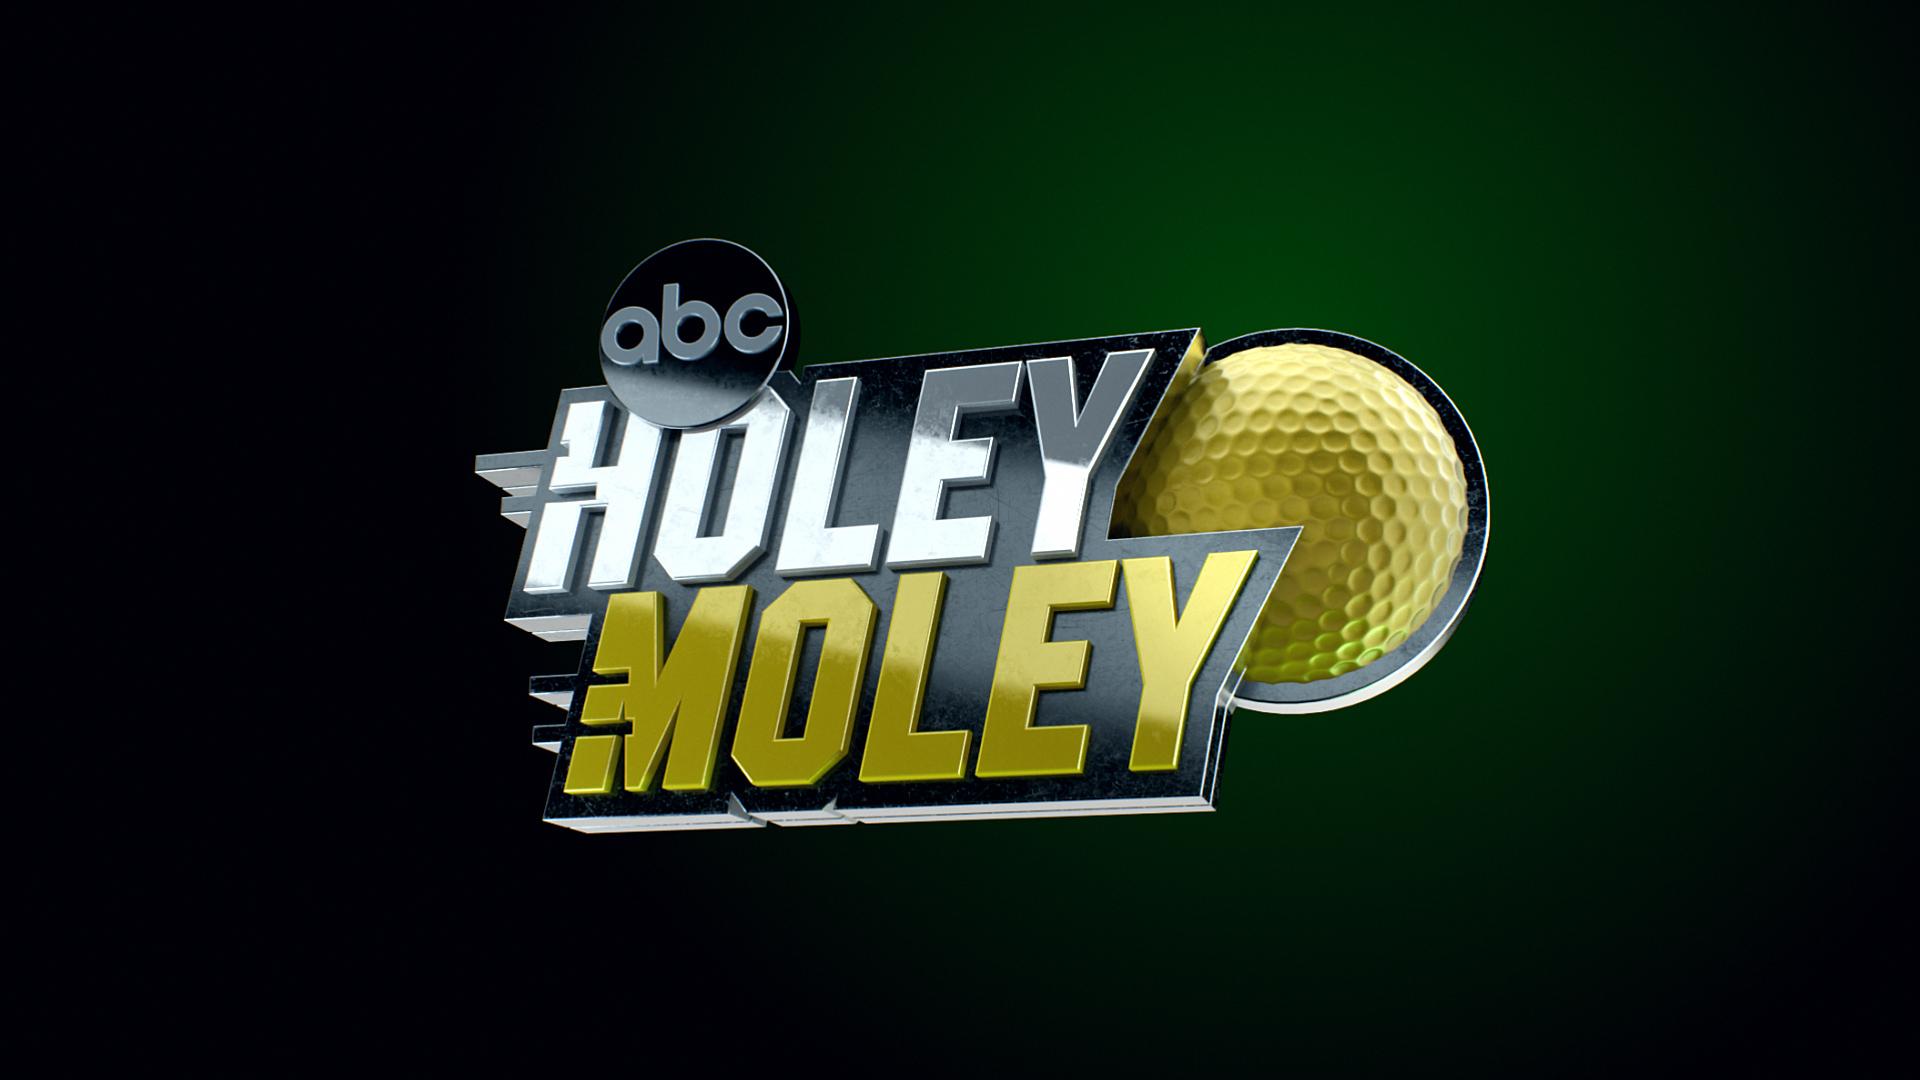 holey2_0002 (00019).jpg